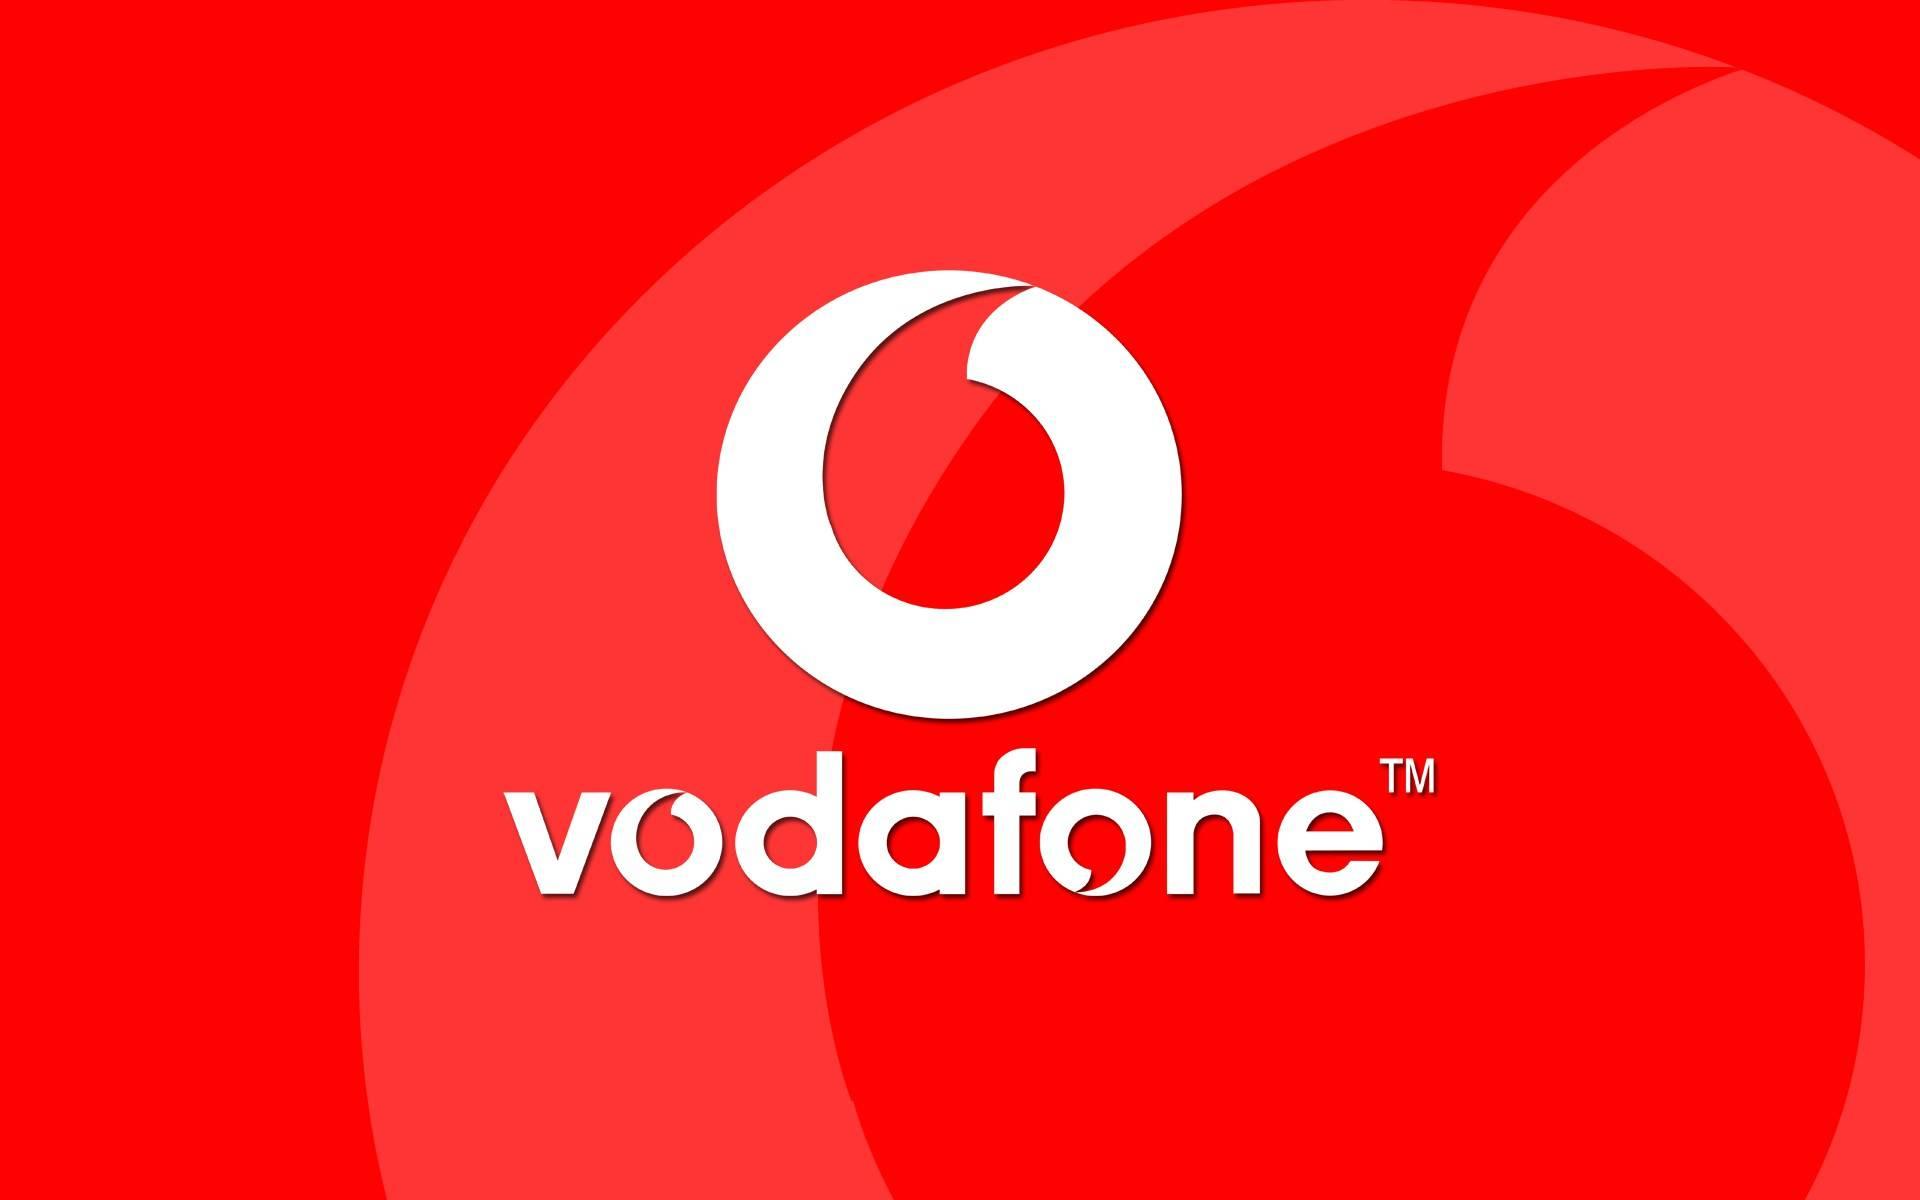 Vodafone. In Romania exista Noi Promotii Foarte bune la Telefoane de care sa Profiti